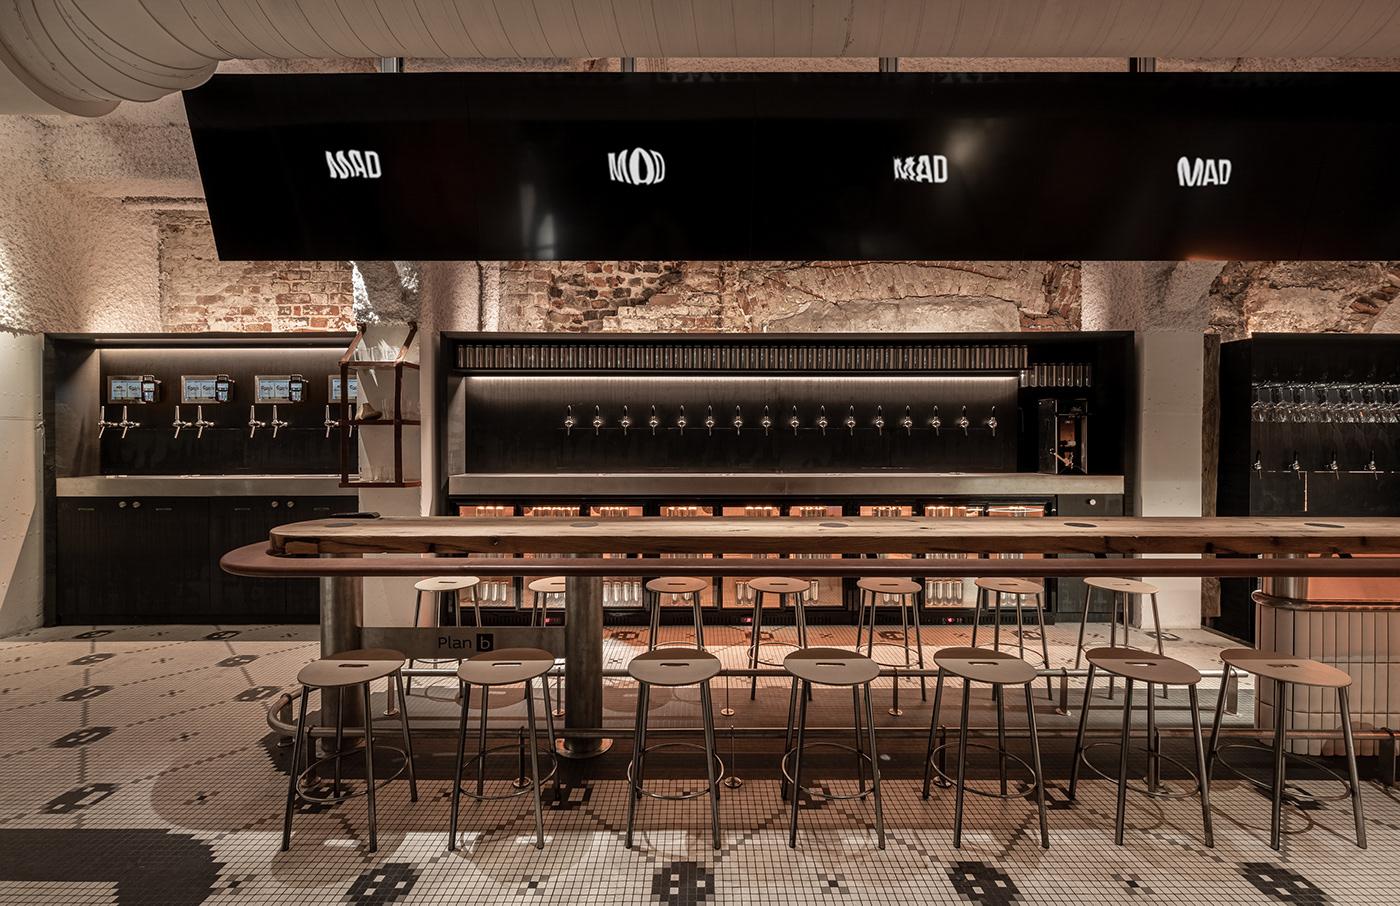 #architecture #bardesign #Design #interiordesign #restaurantdesign #yodgroup #yodlabdesign